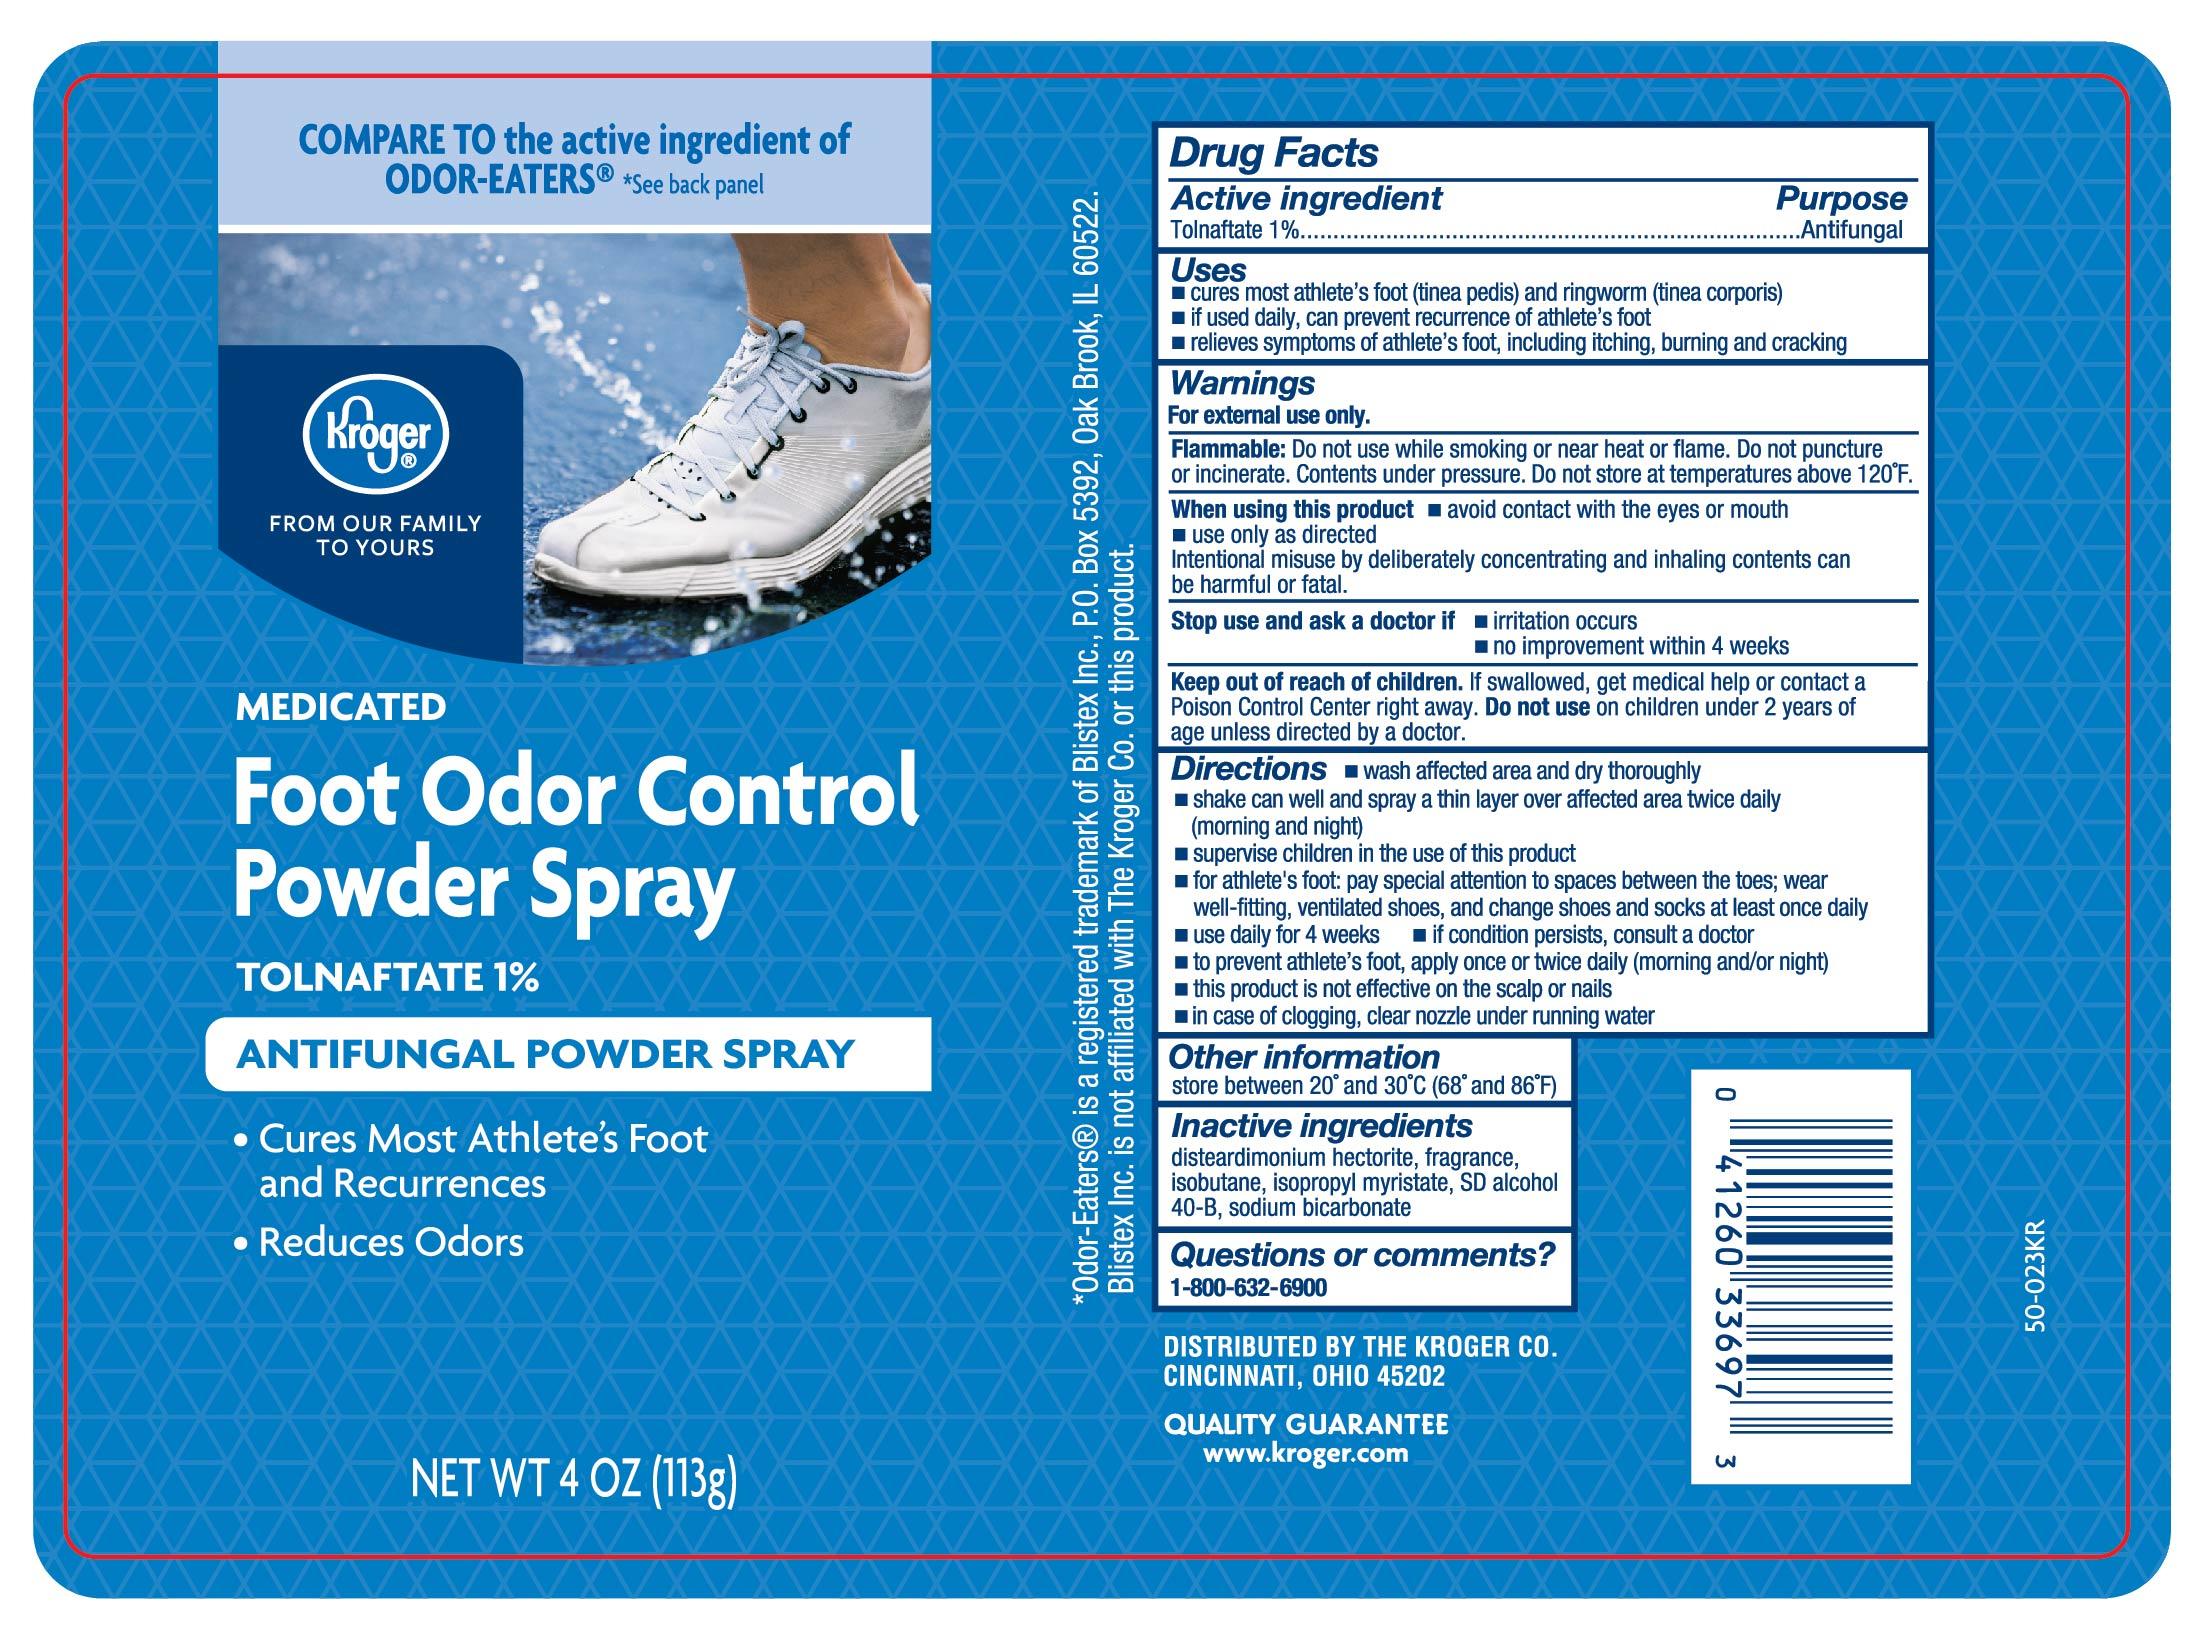 KROGER_Foot Odor Control Powder Spray.jpg